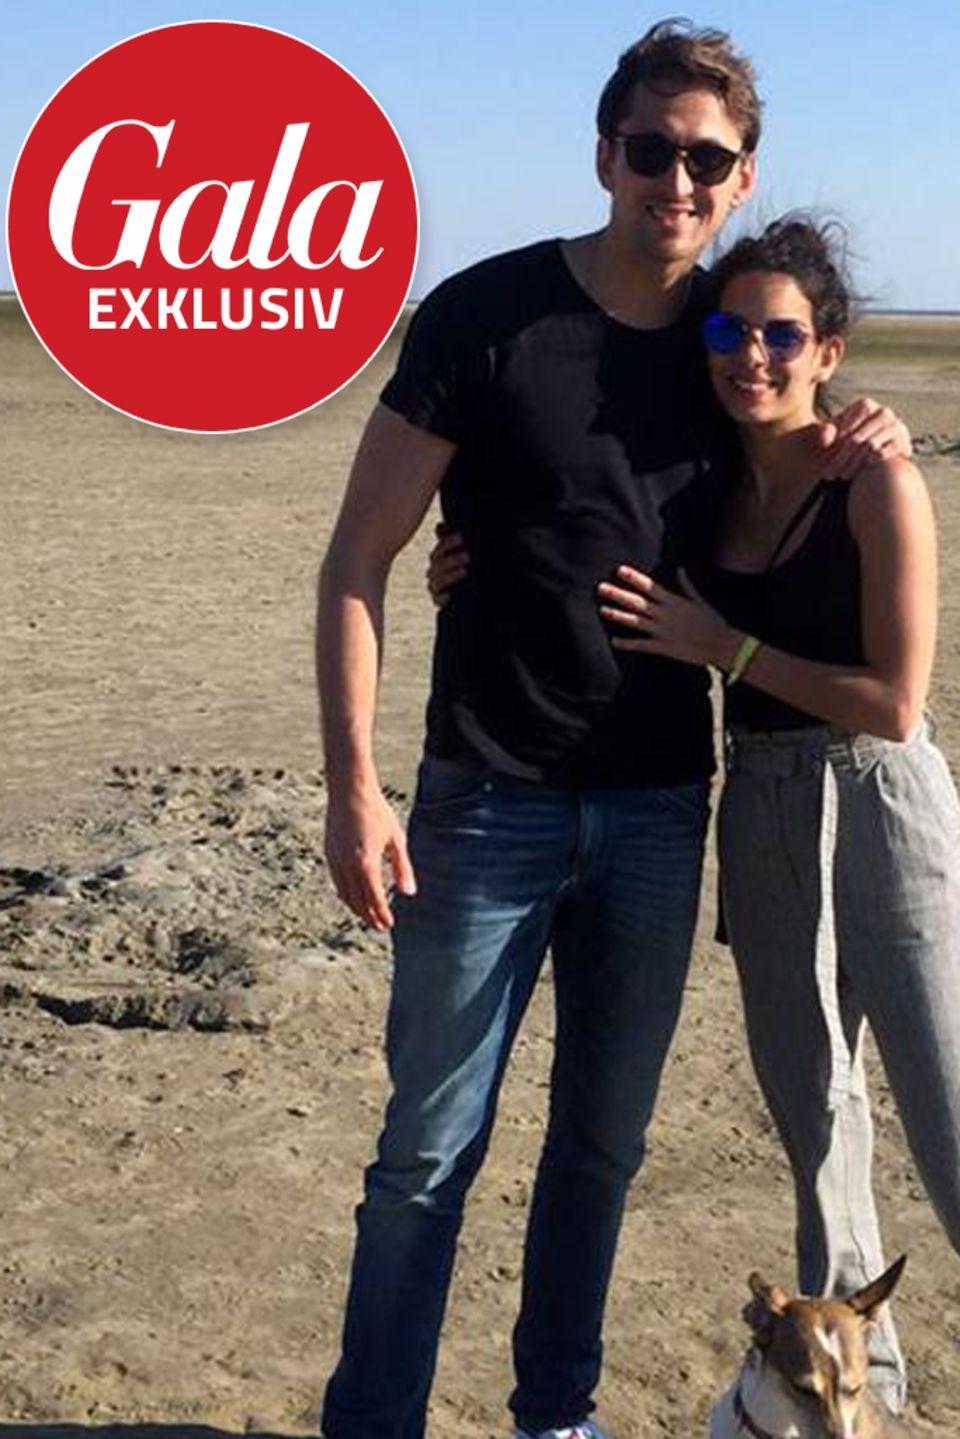 Fußballer René Adler mit Freundin Lilli Hollunder